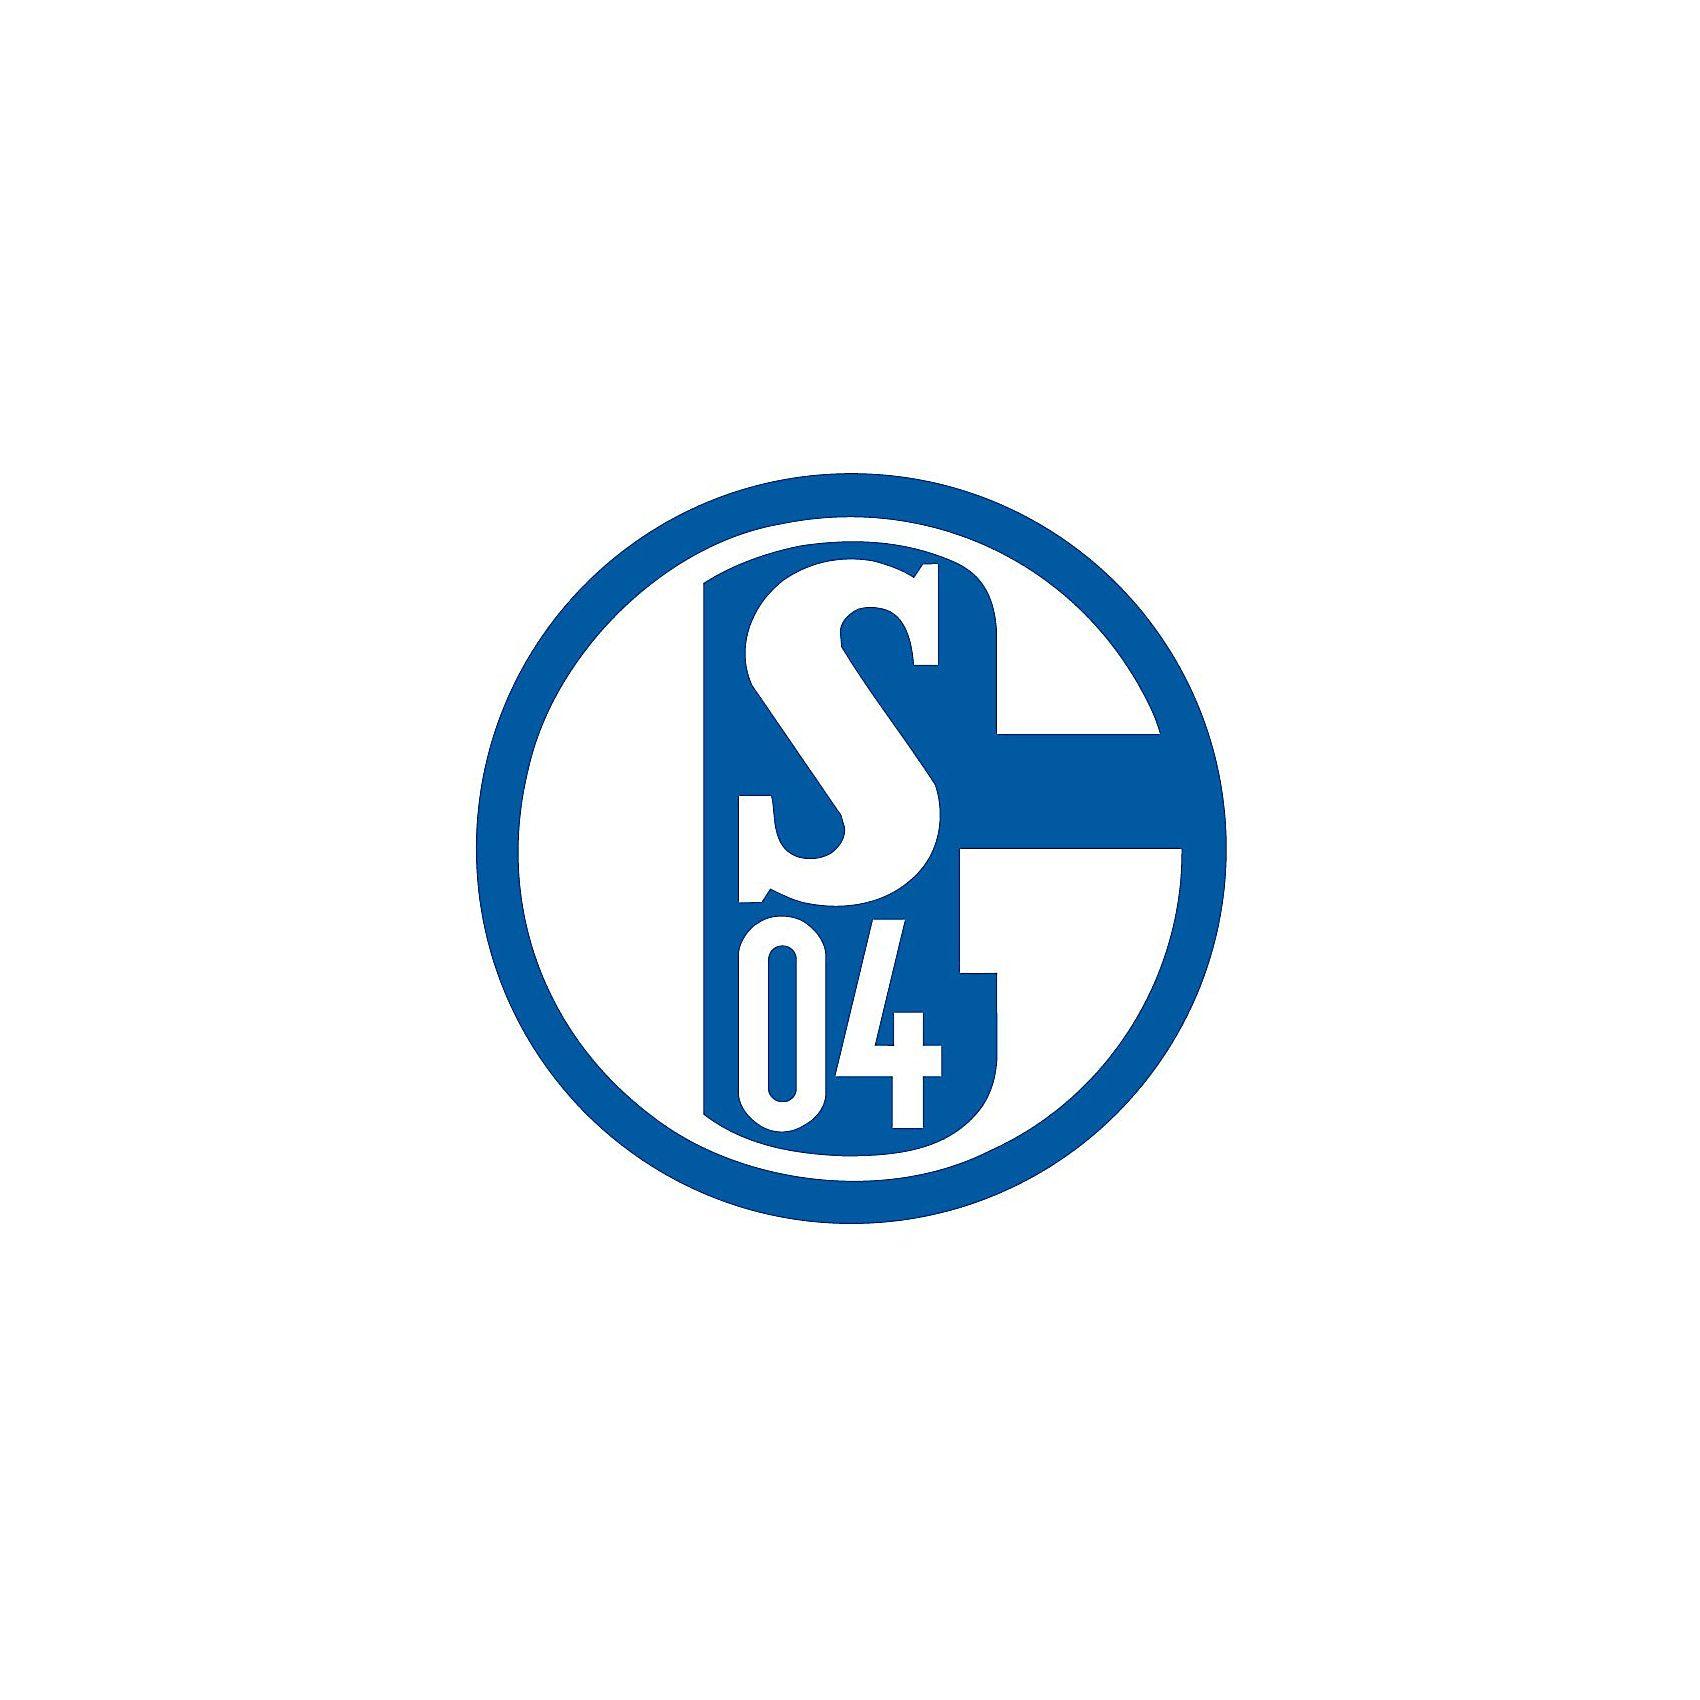 Wandsticker FC Schalke 04, Logo